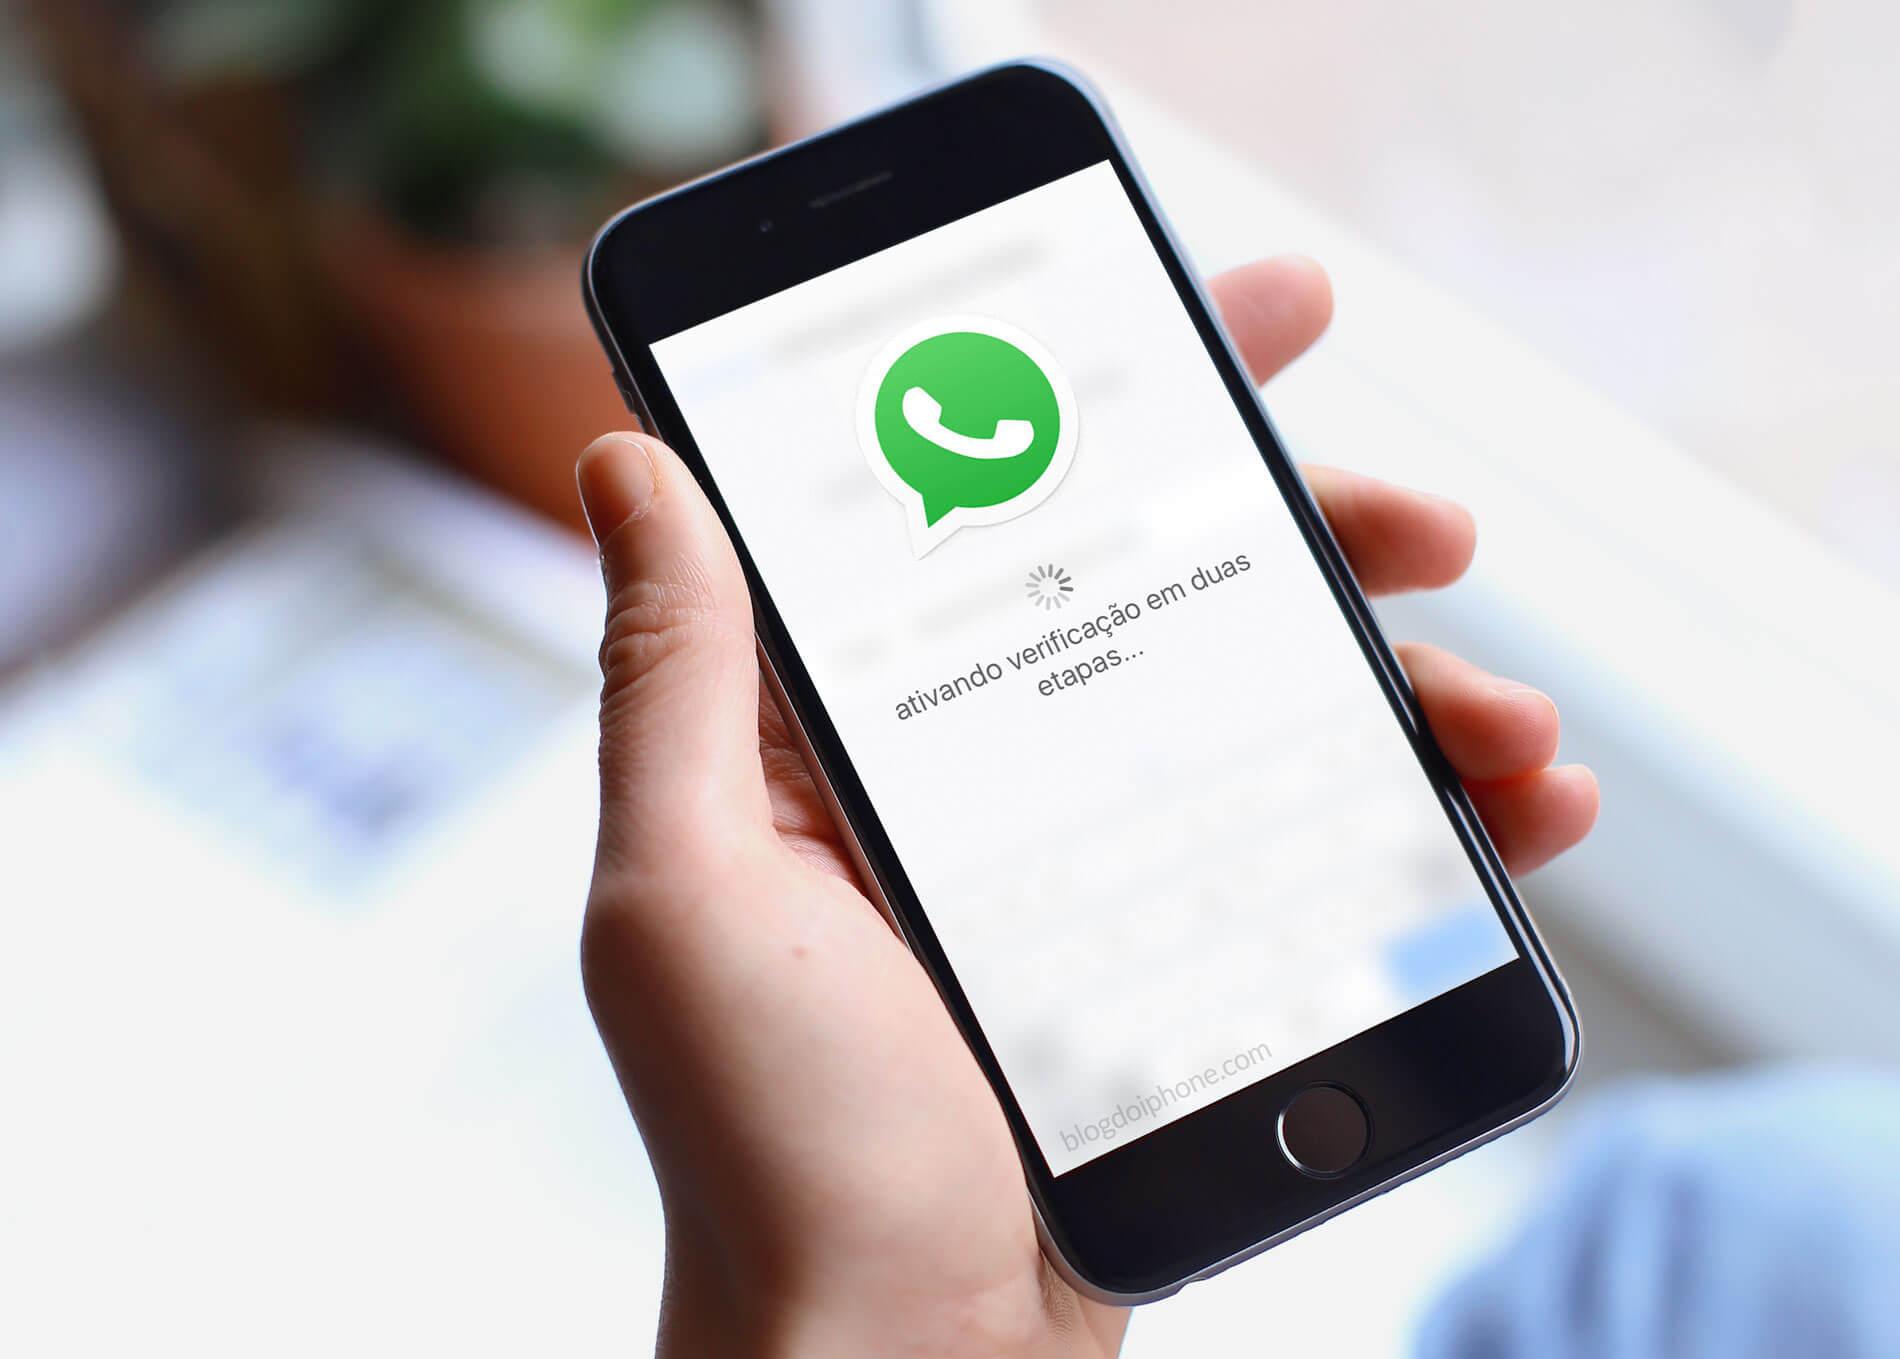 como colocar whatsapp no iphone 4s